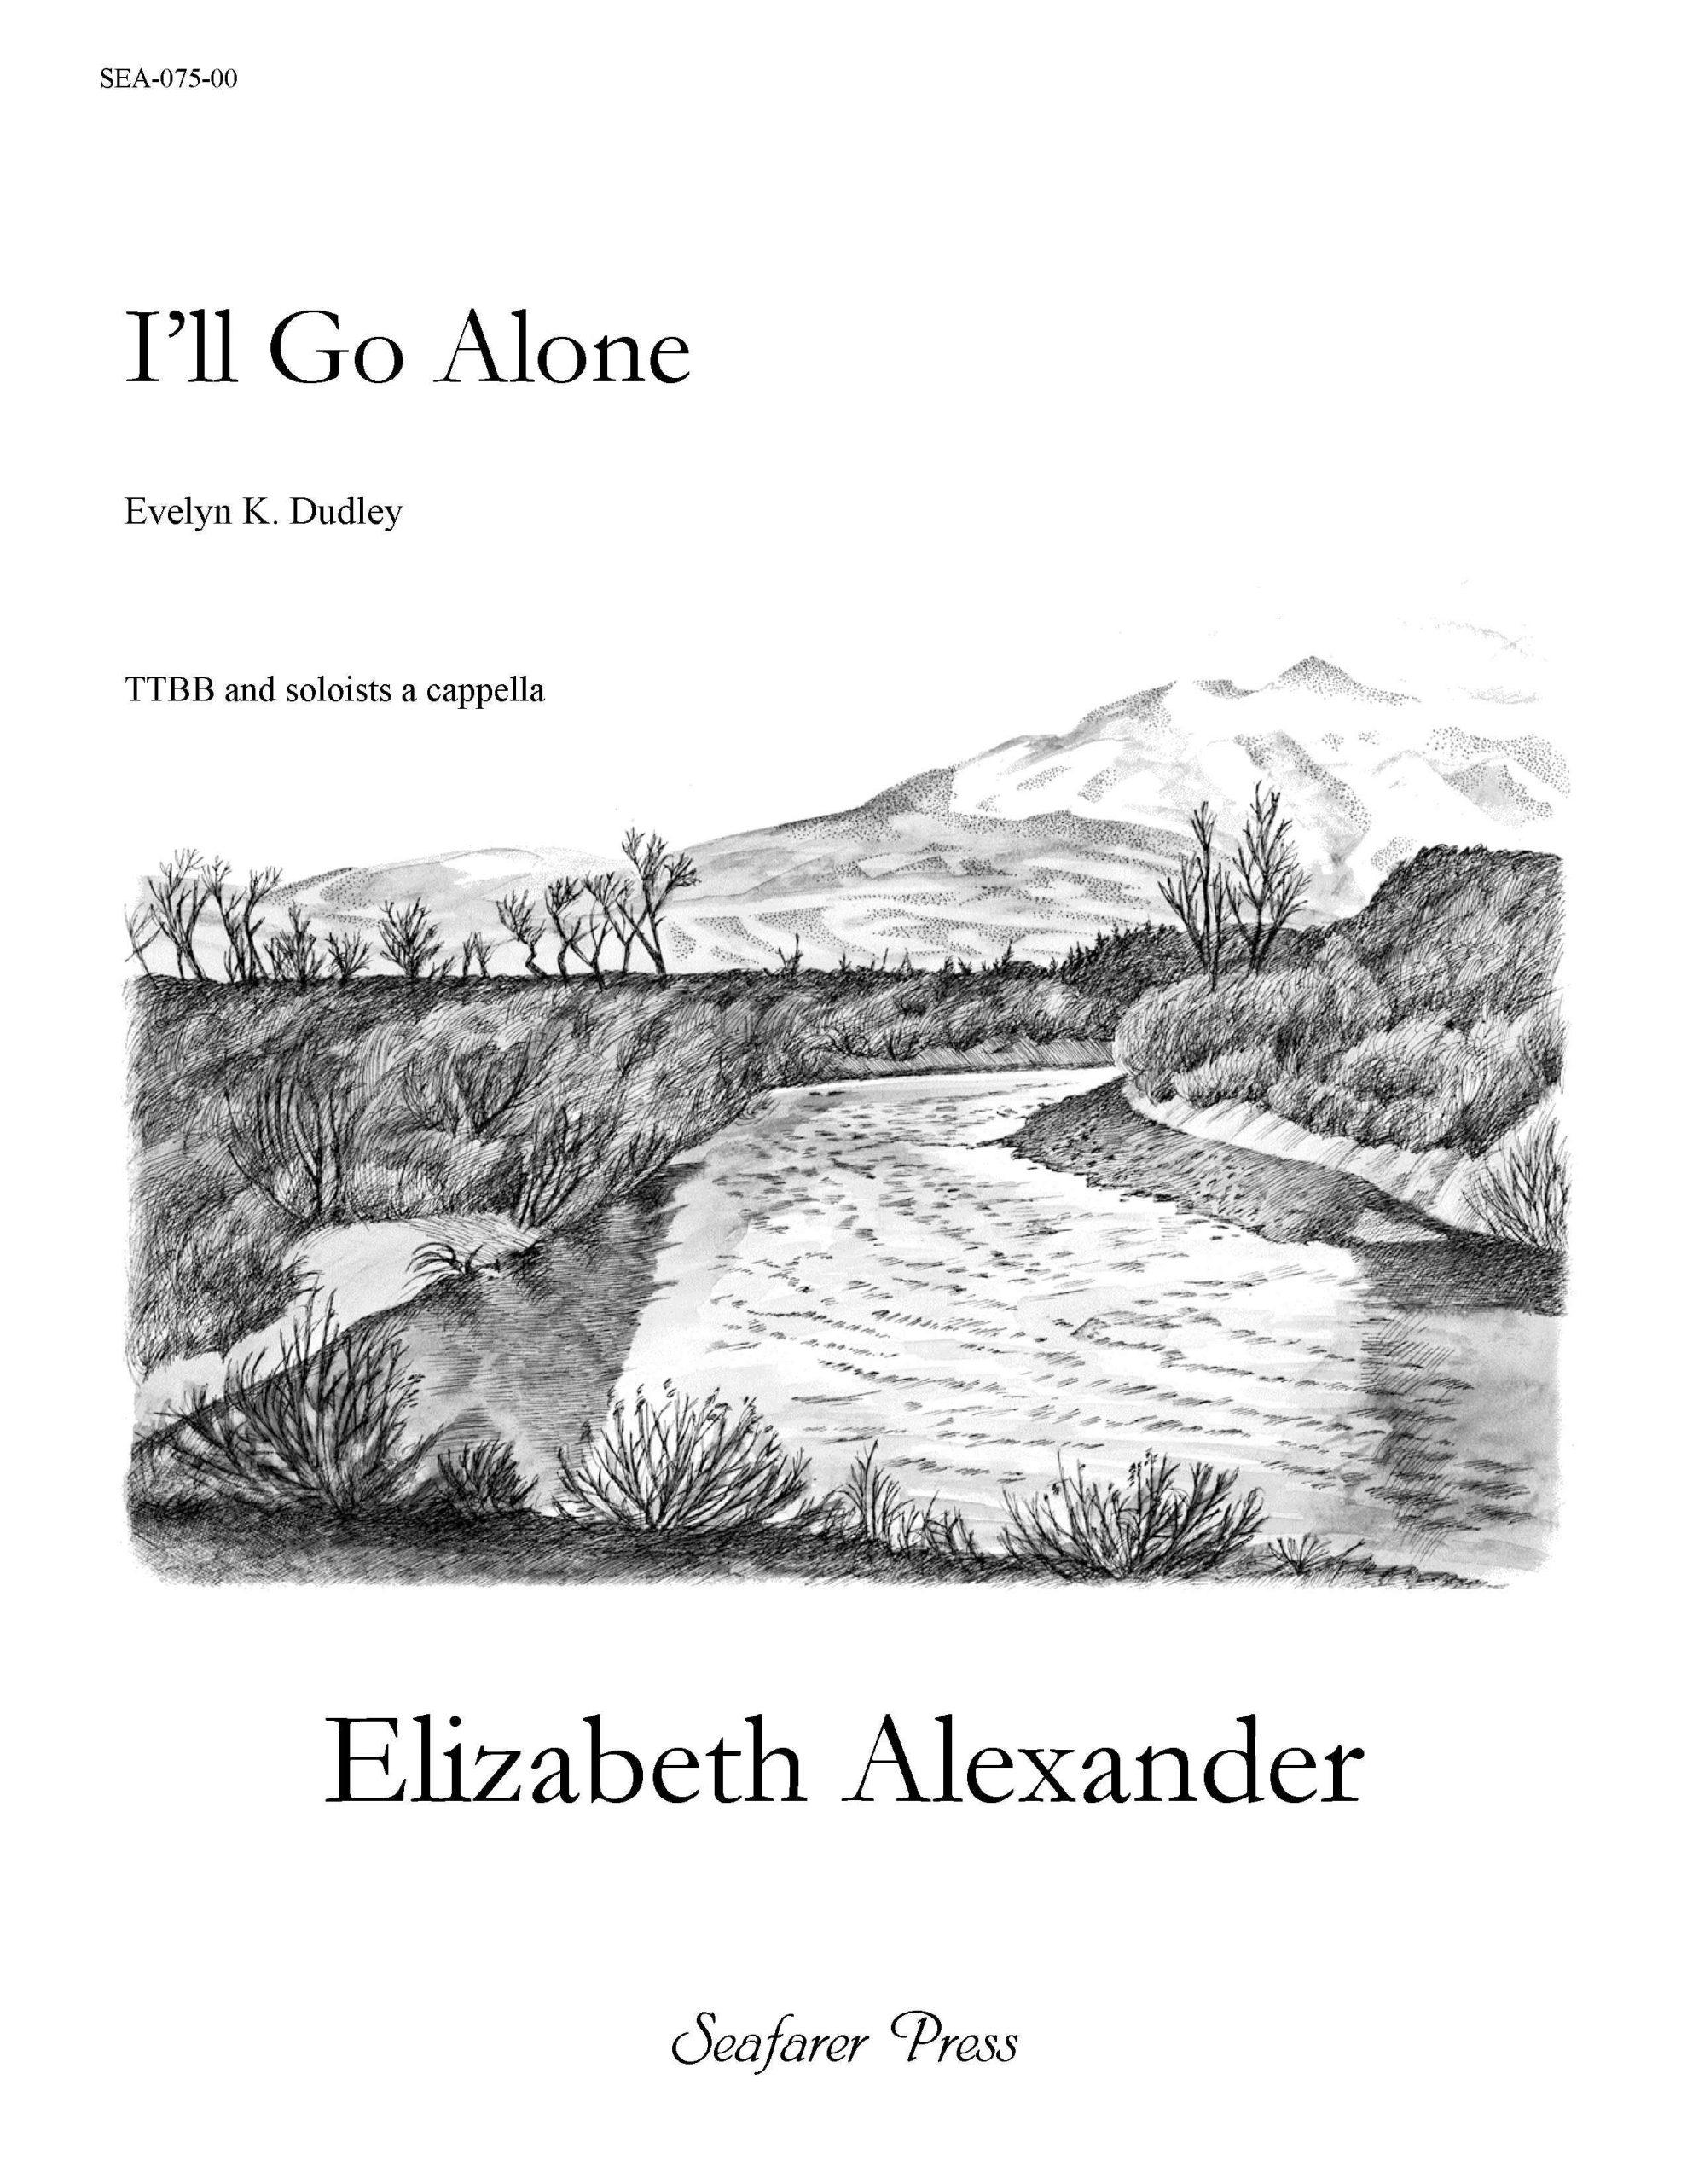 SEA-075-04 - I'll Go Alone (TTBB)